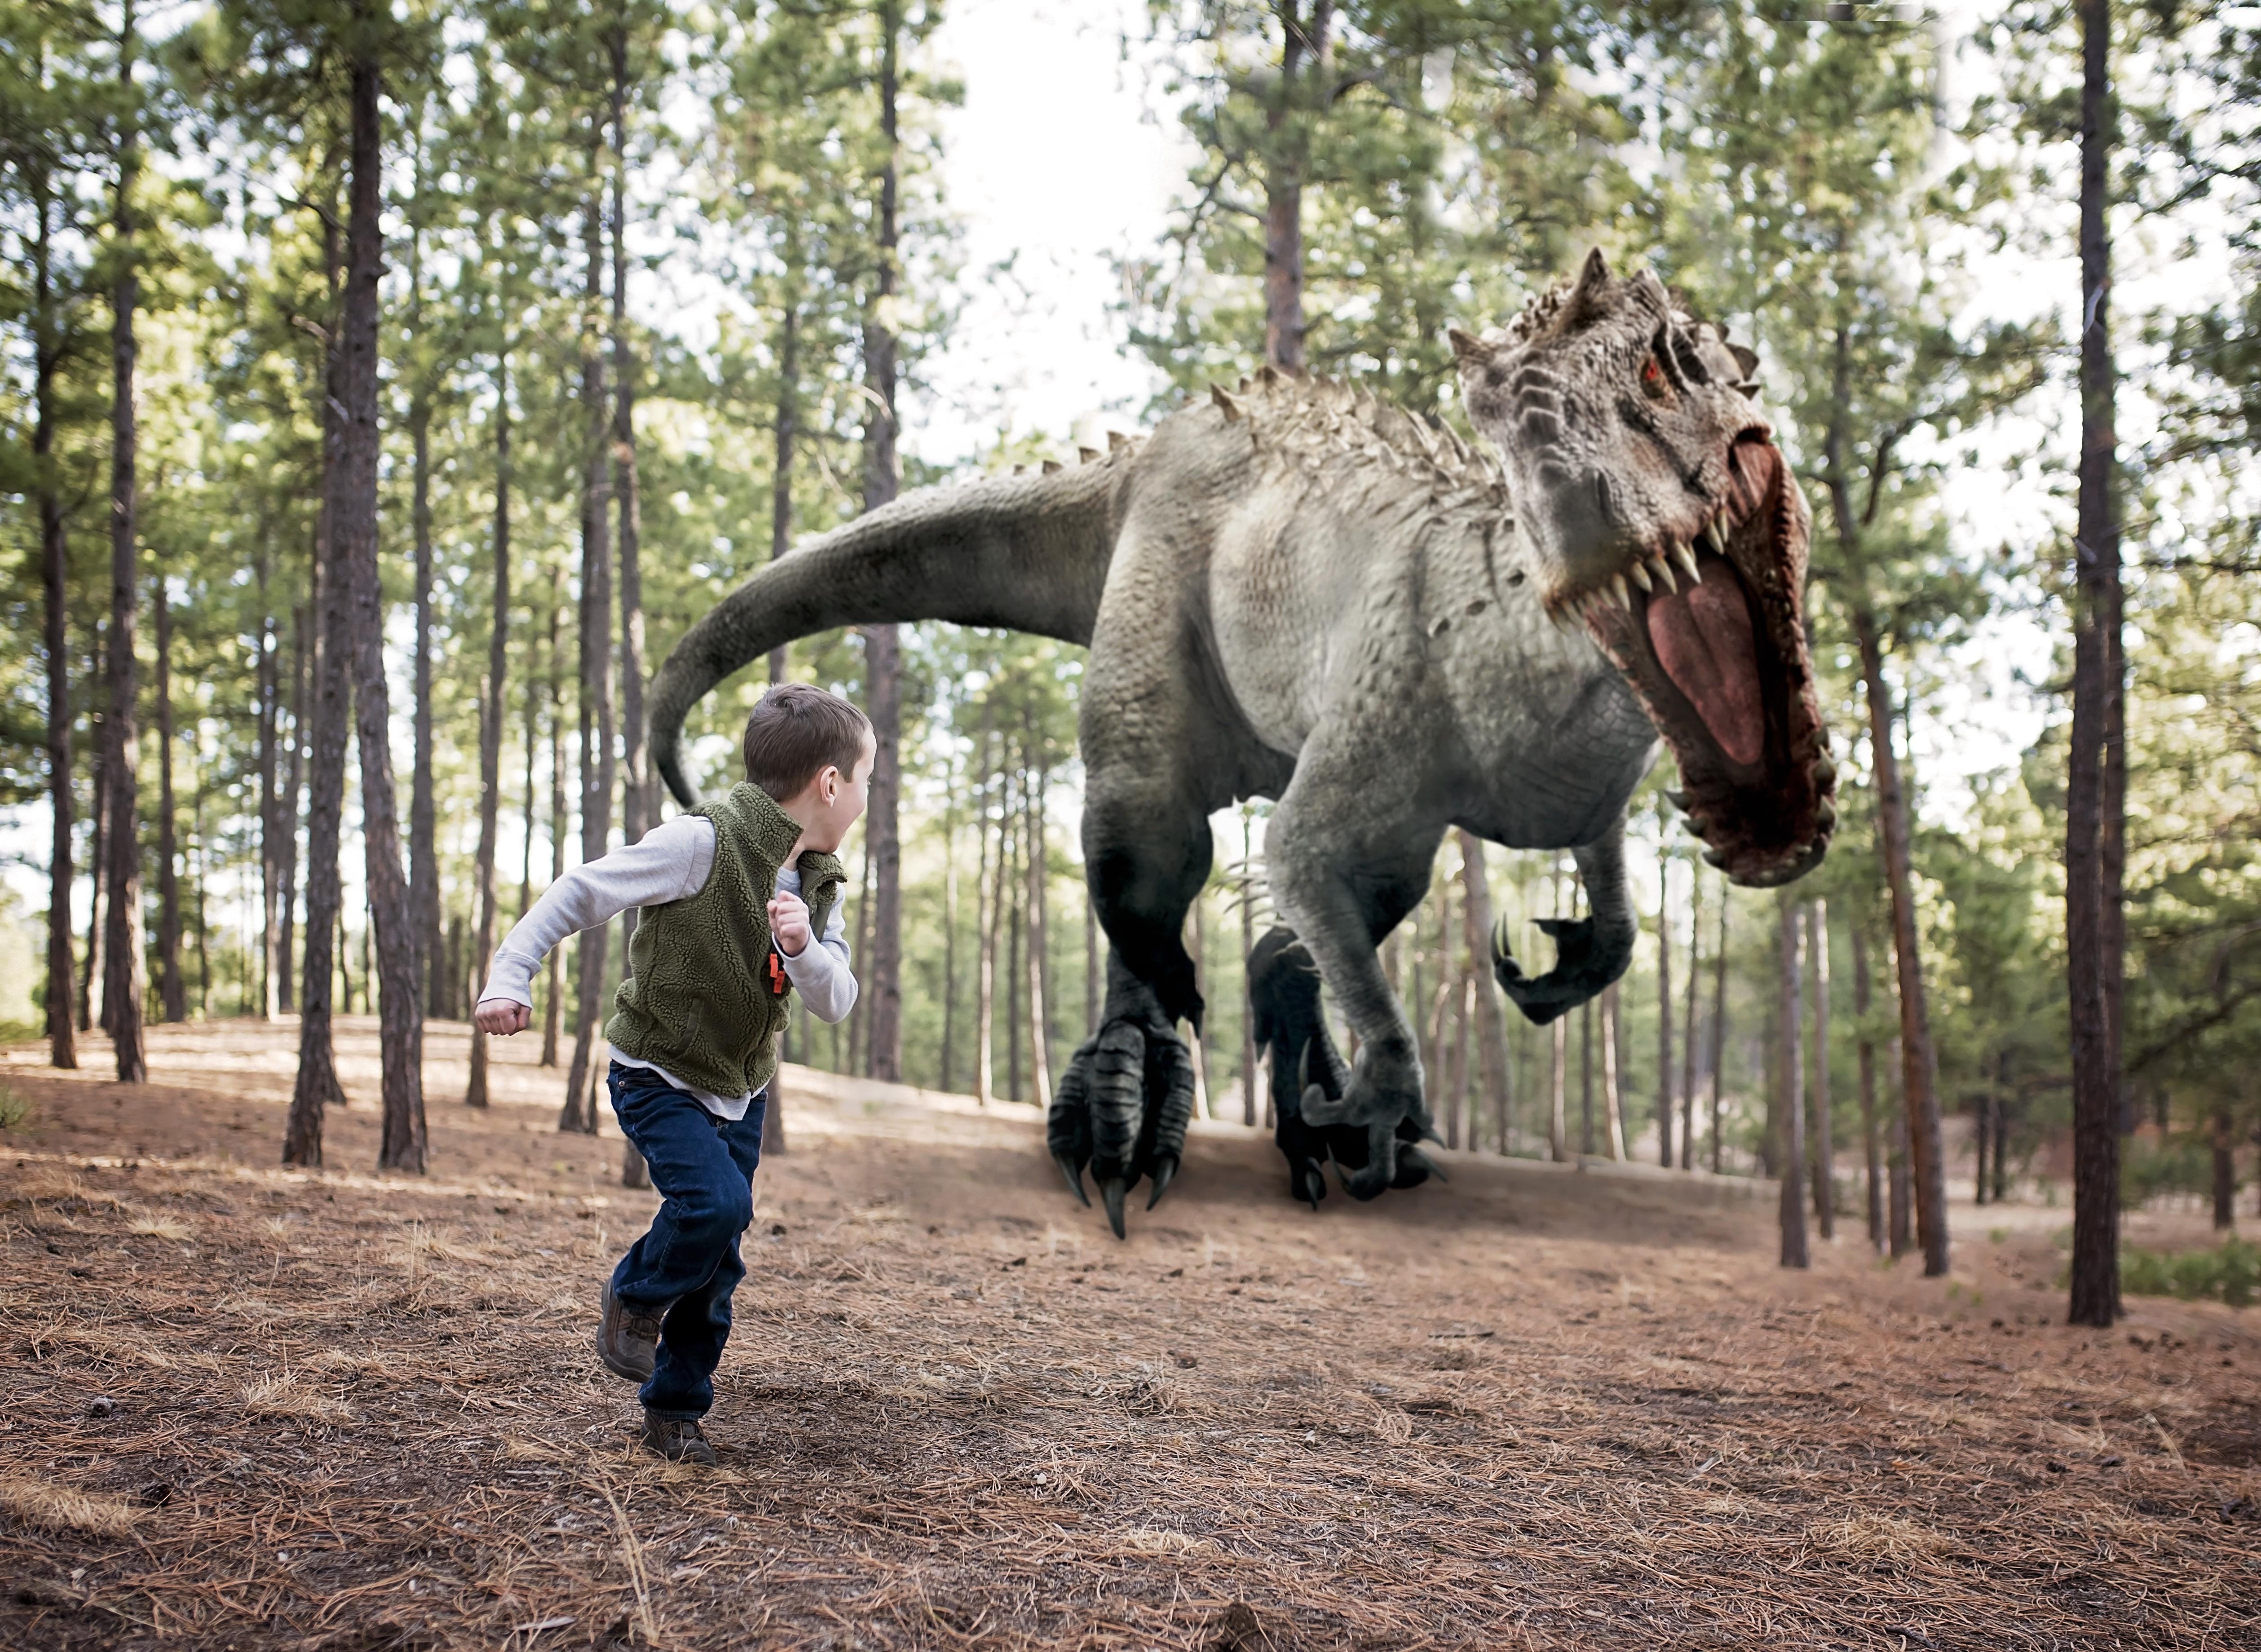 T-rex Imagination